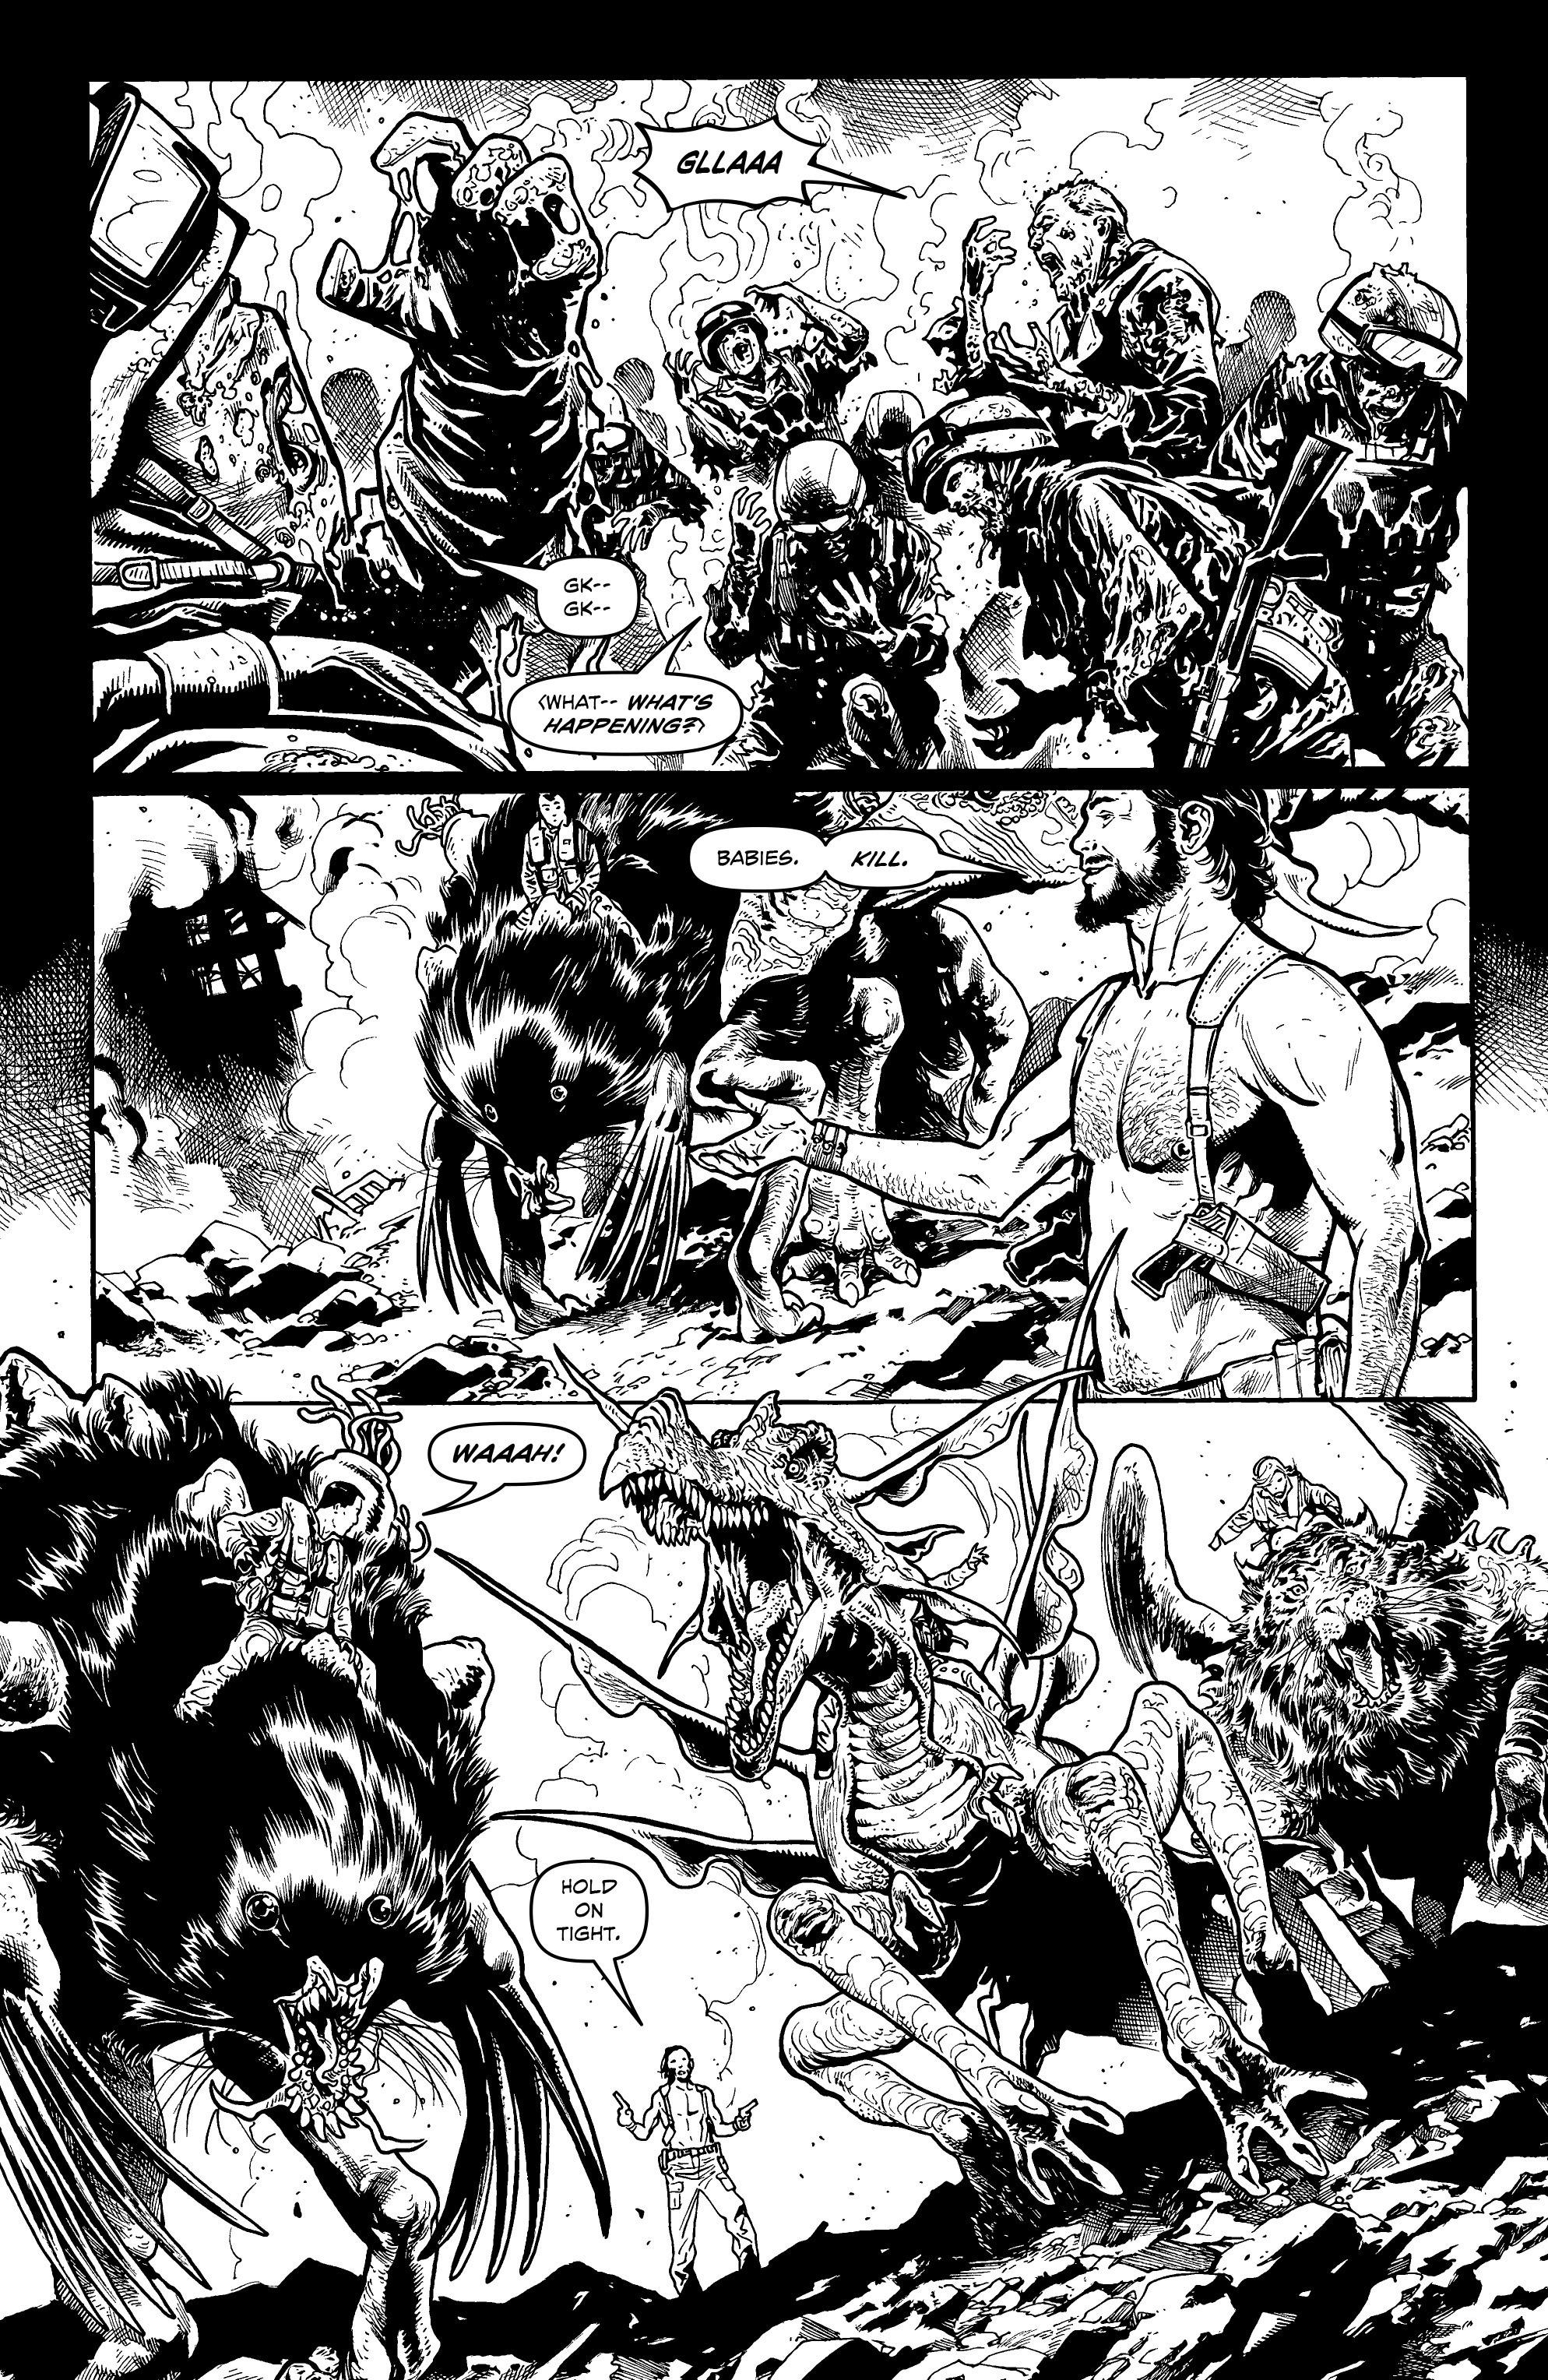 Read online Alan Moore's Cinema Purgatorio comic -  Issue #6 - 48